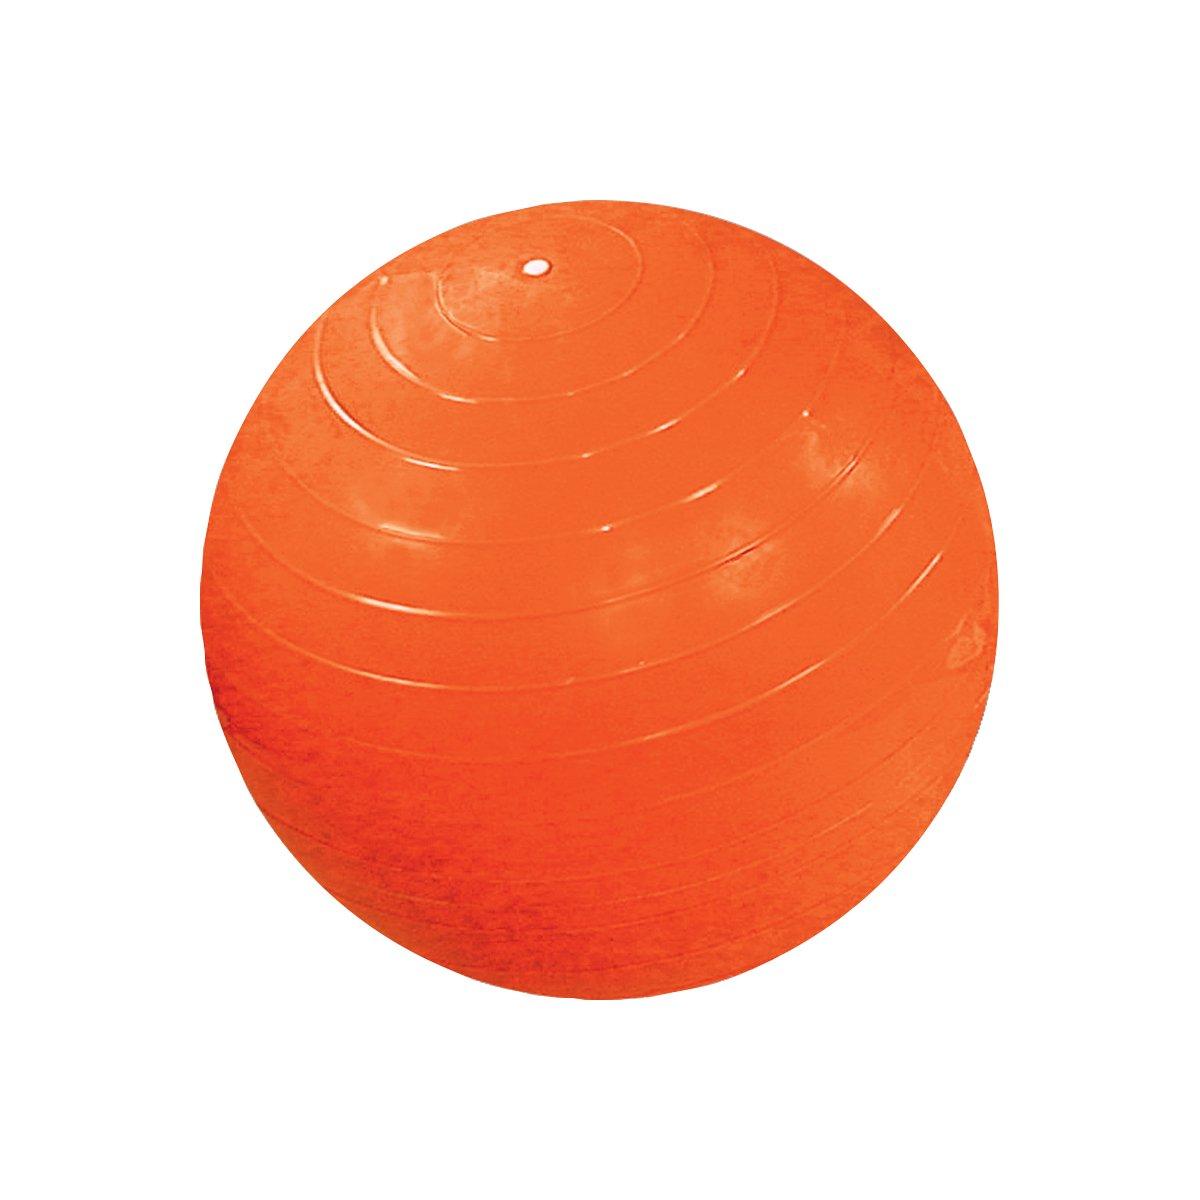 Cando 30-1807 Orange Non-Slip PVC Vinyl Inflatable Exercise Ball, 48'' Diameter, 300 lbs Weight Capacity by Cando